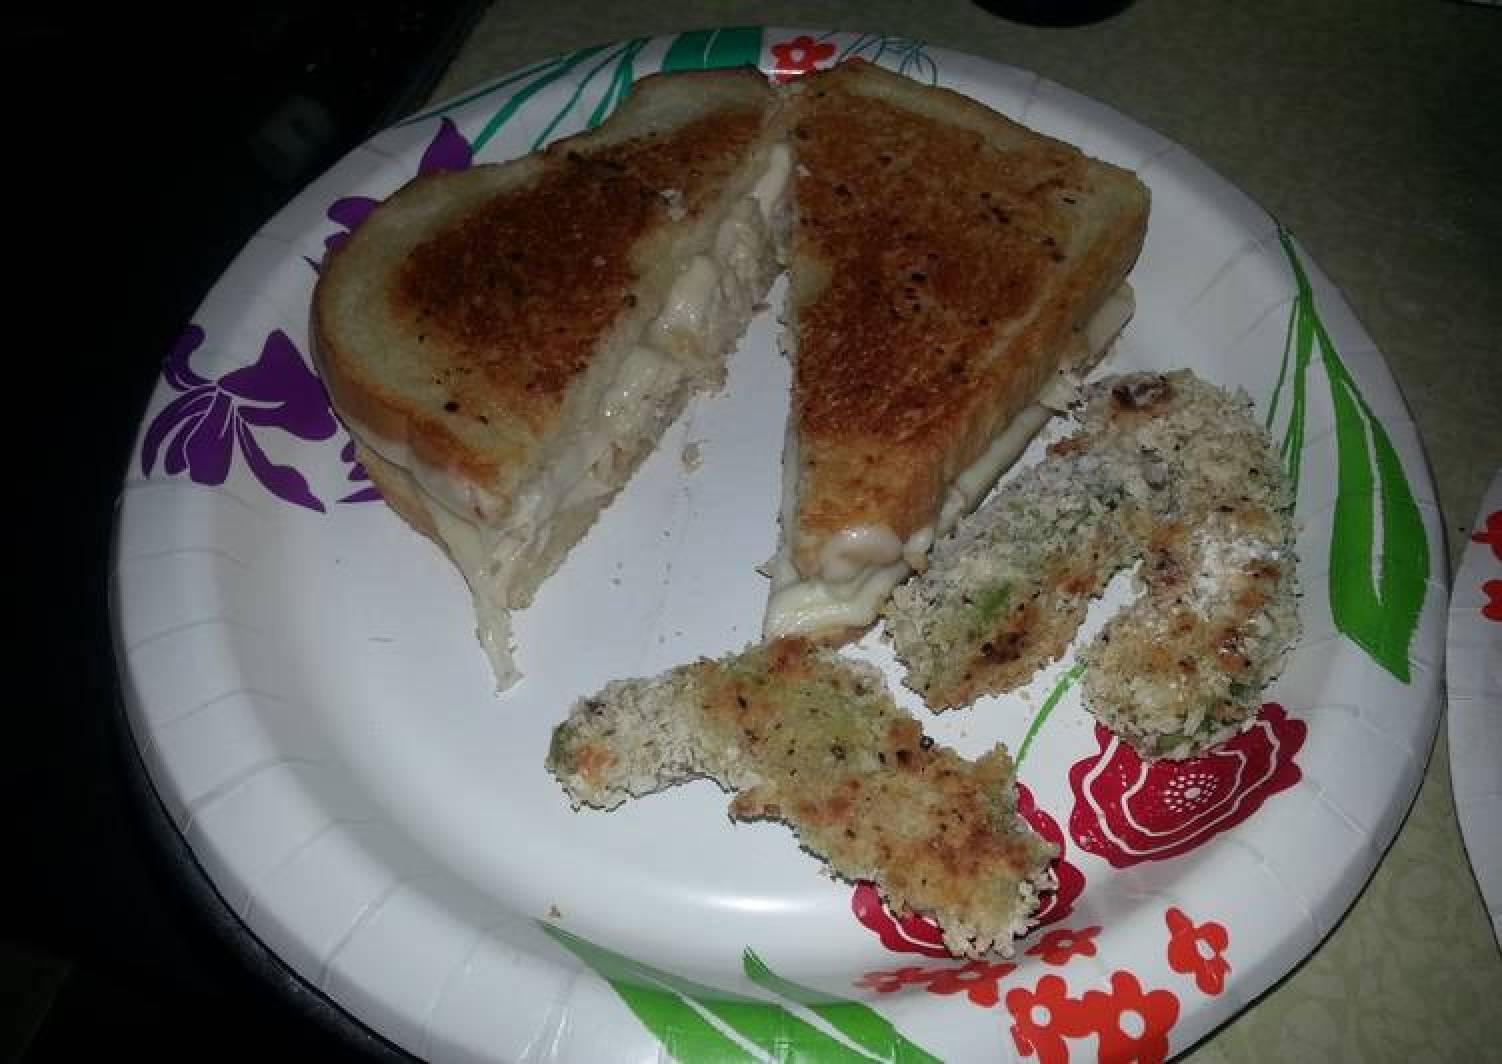 Grilled turkey and havarti sandwiches with garlic mayo